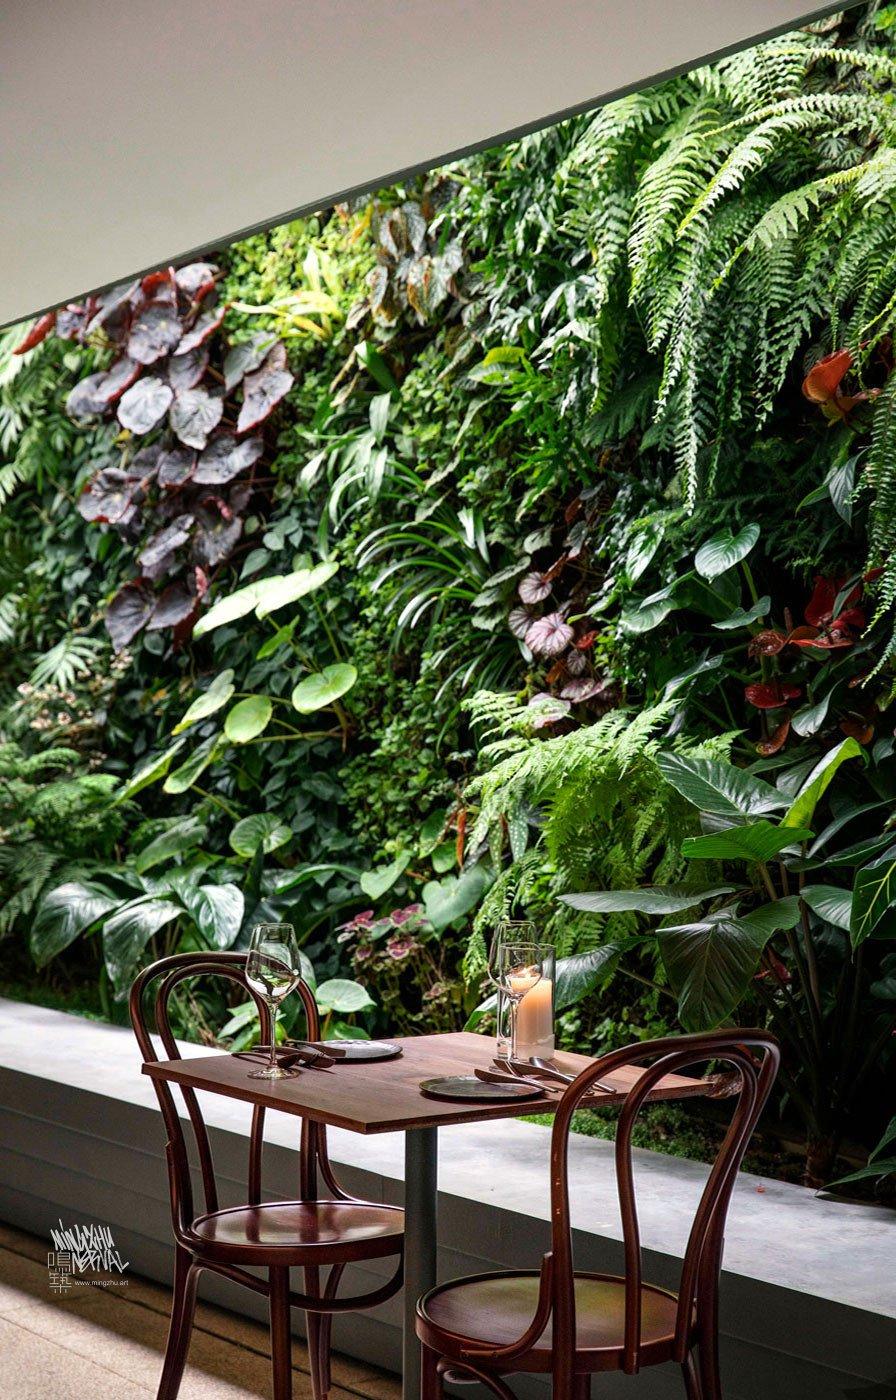 Mingzhu Nerval vertical living wall experts created the best garden design art for the Bloom restaurant in Shanghai, 2018